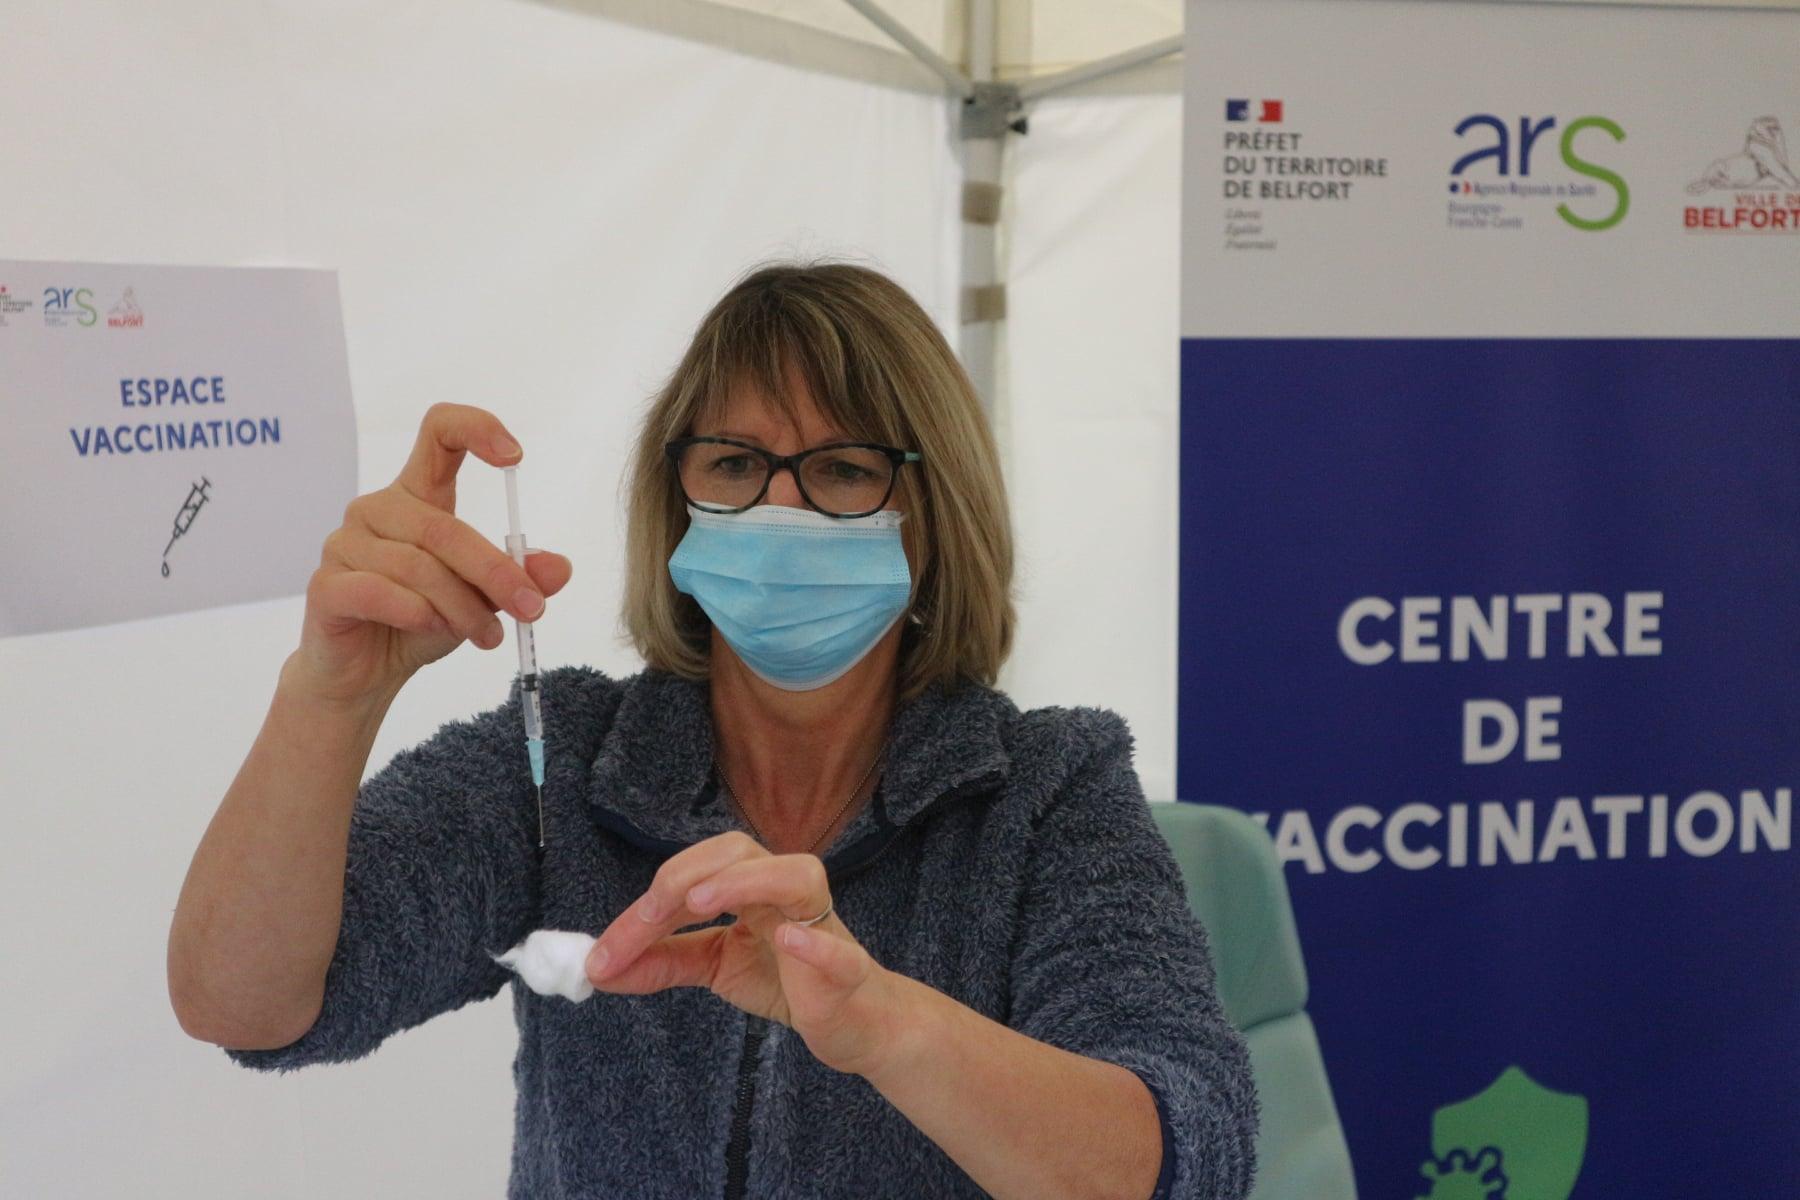 Centre vaccination Belfort (prefet 90)